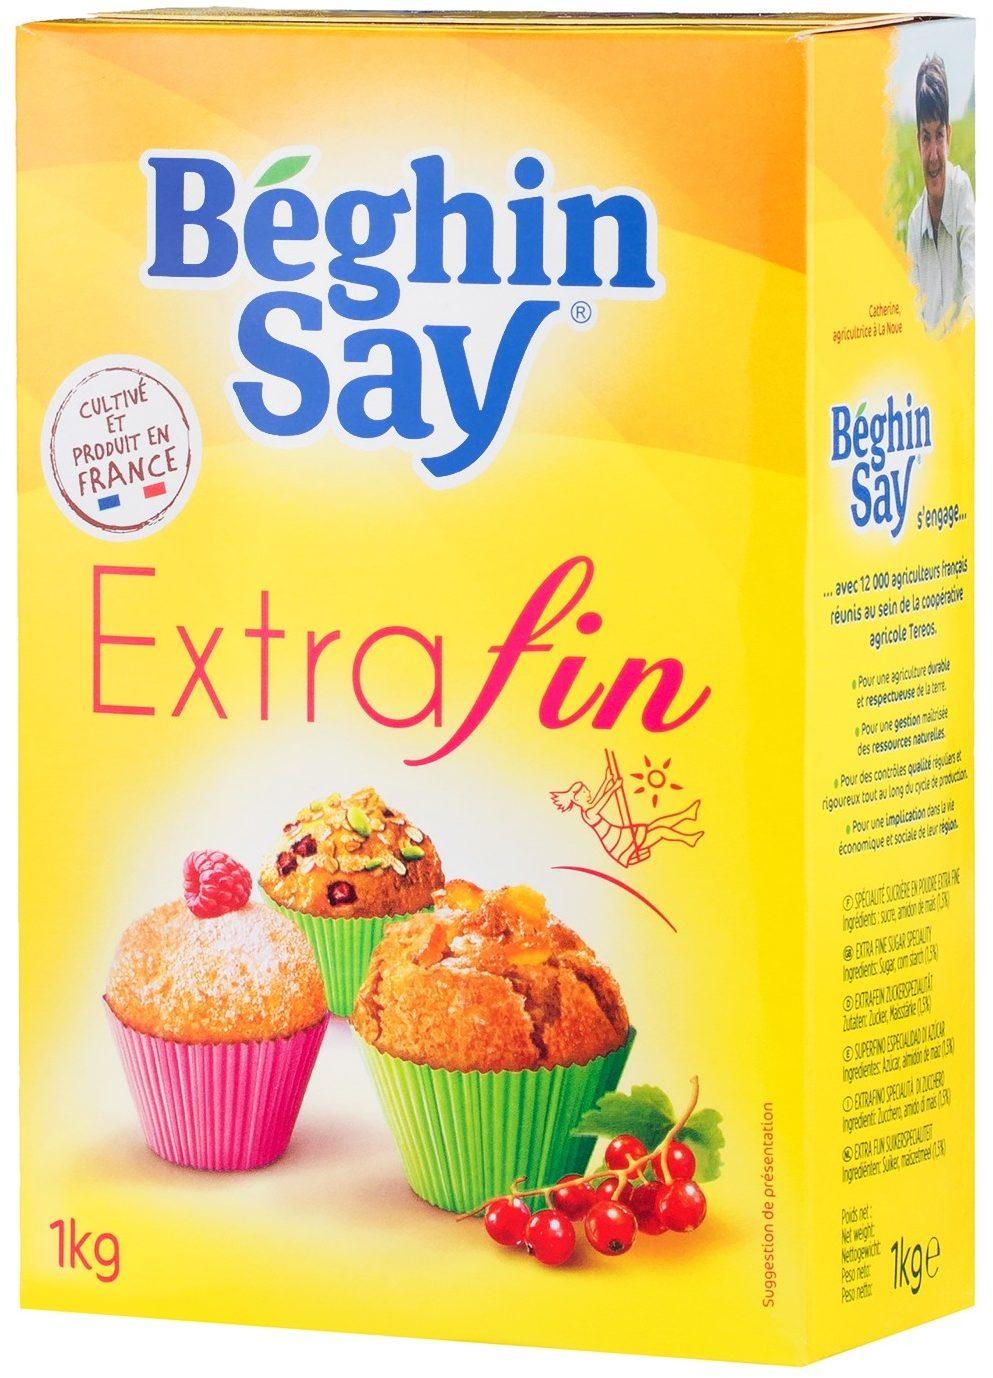 Extra fin Béghin-Say® - Produit - fr